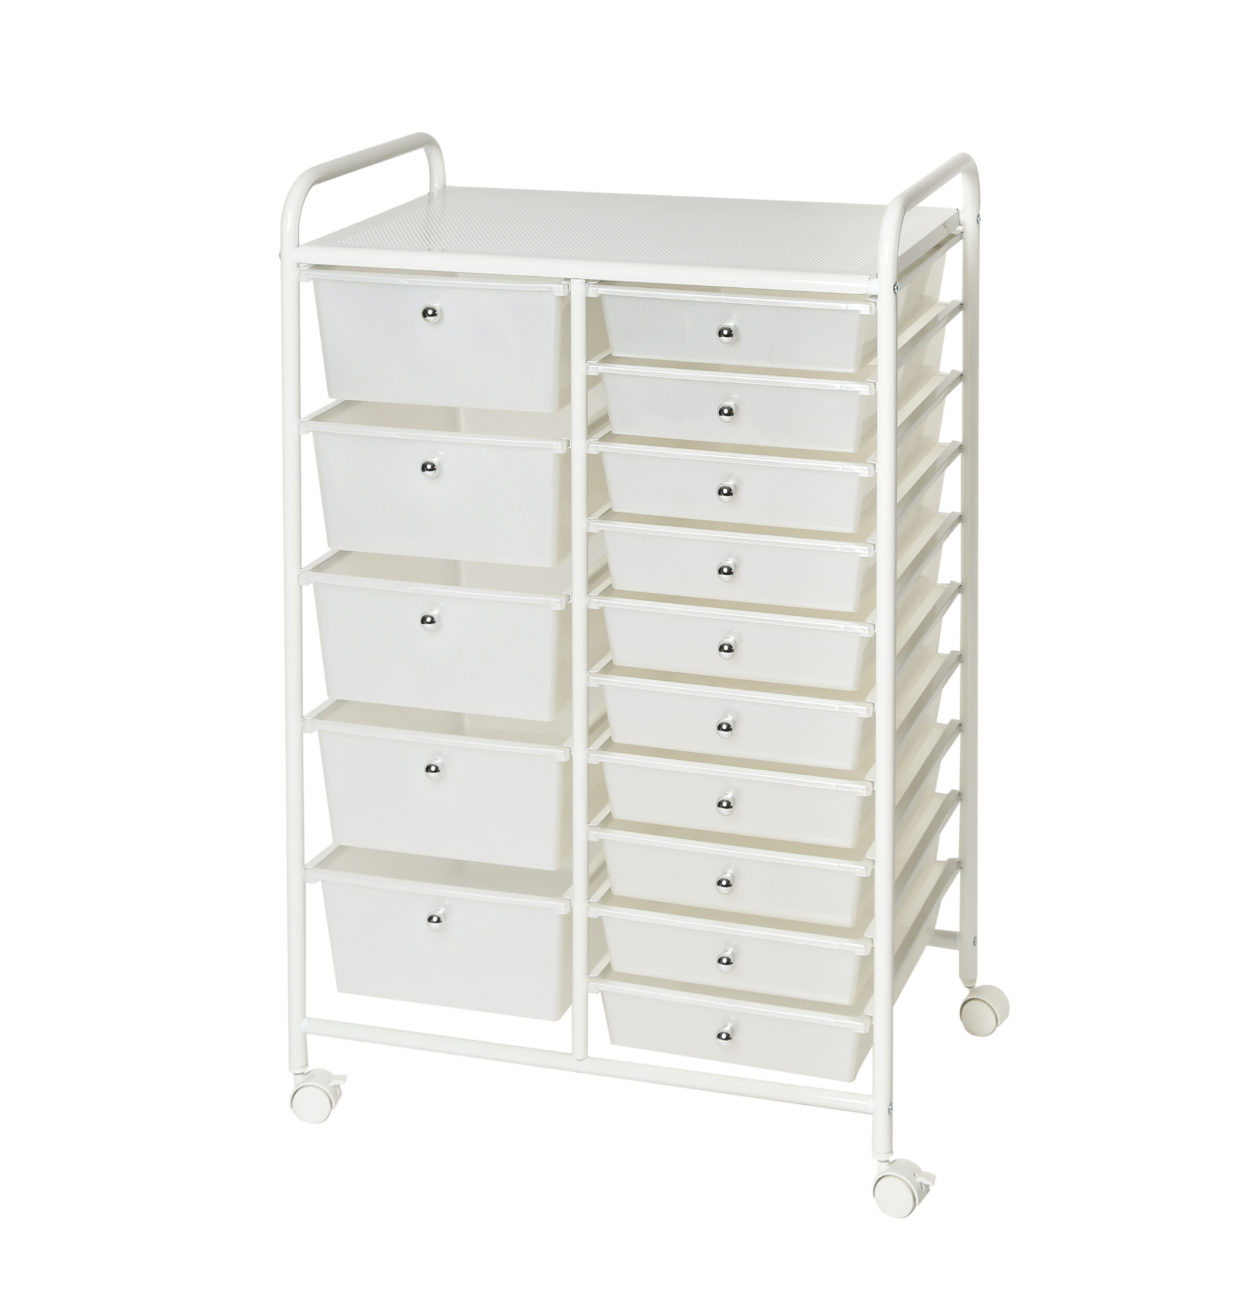 Seville Classics 15-Drawer Organizer Cart, White Home & Garden